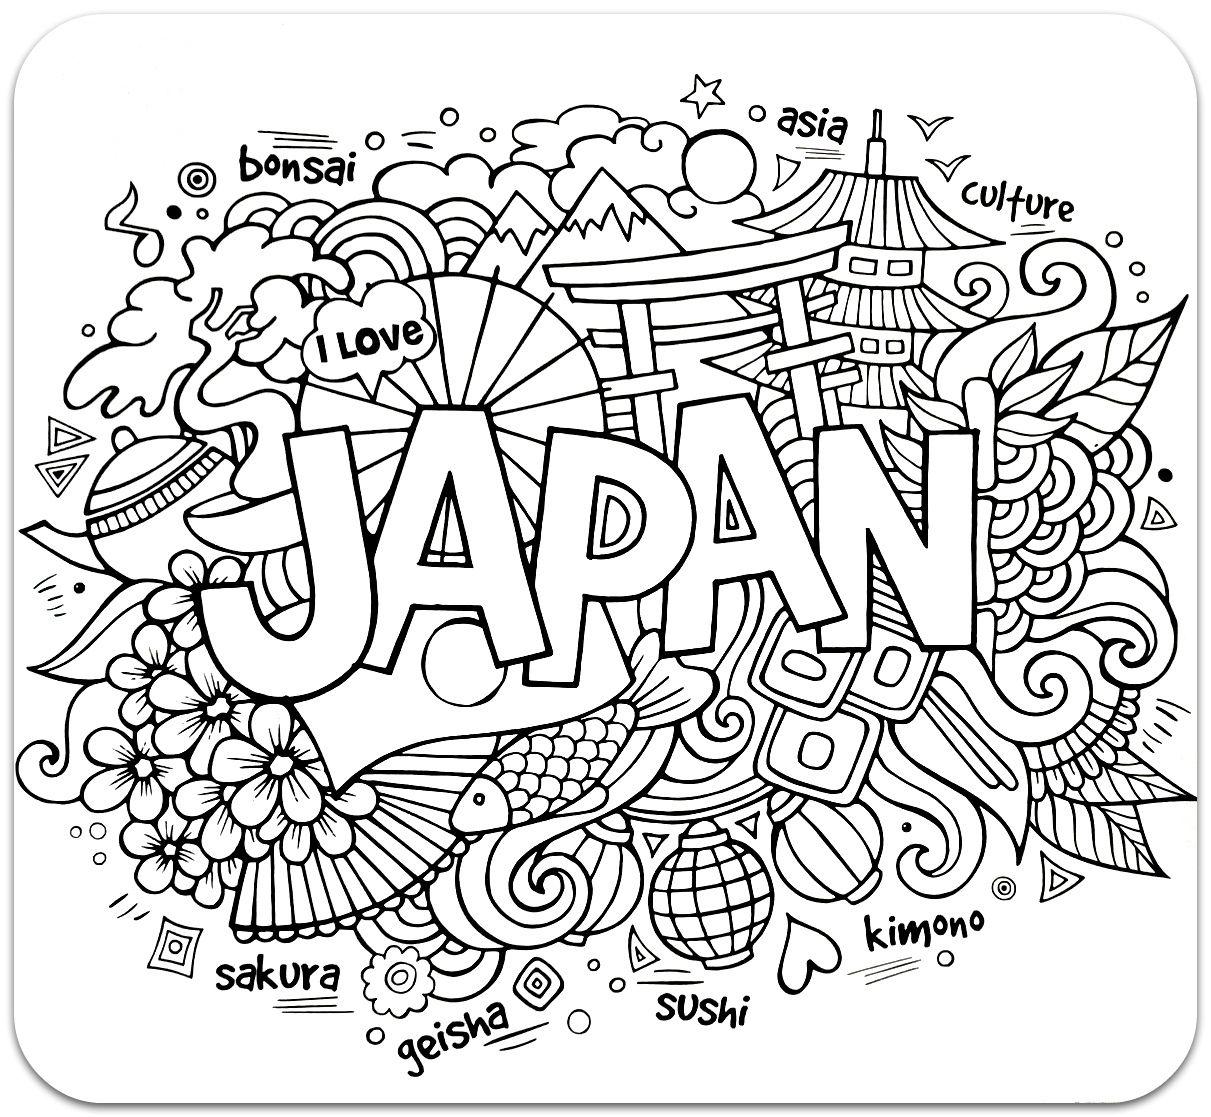 Pin de Kevinn Hernandez en Ideas | Pinterest | Mandalas, Colorear y ...